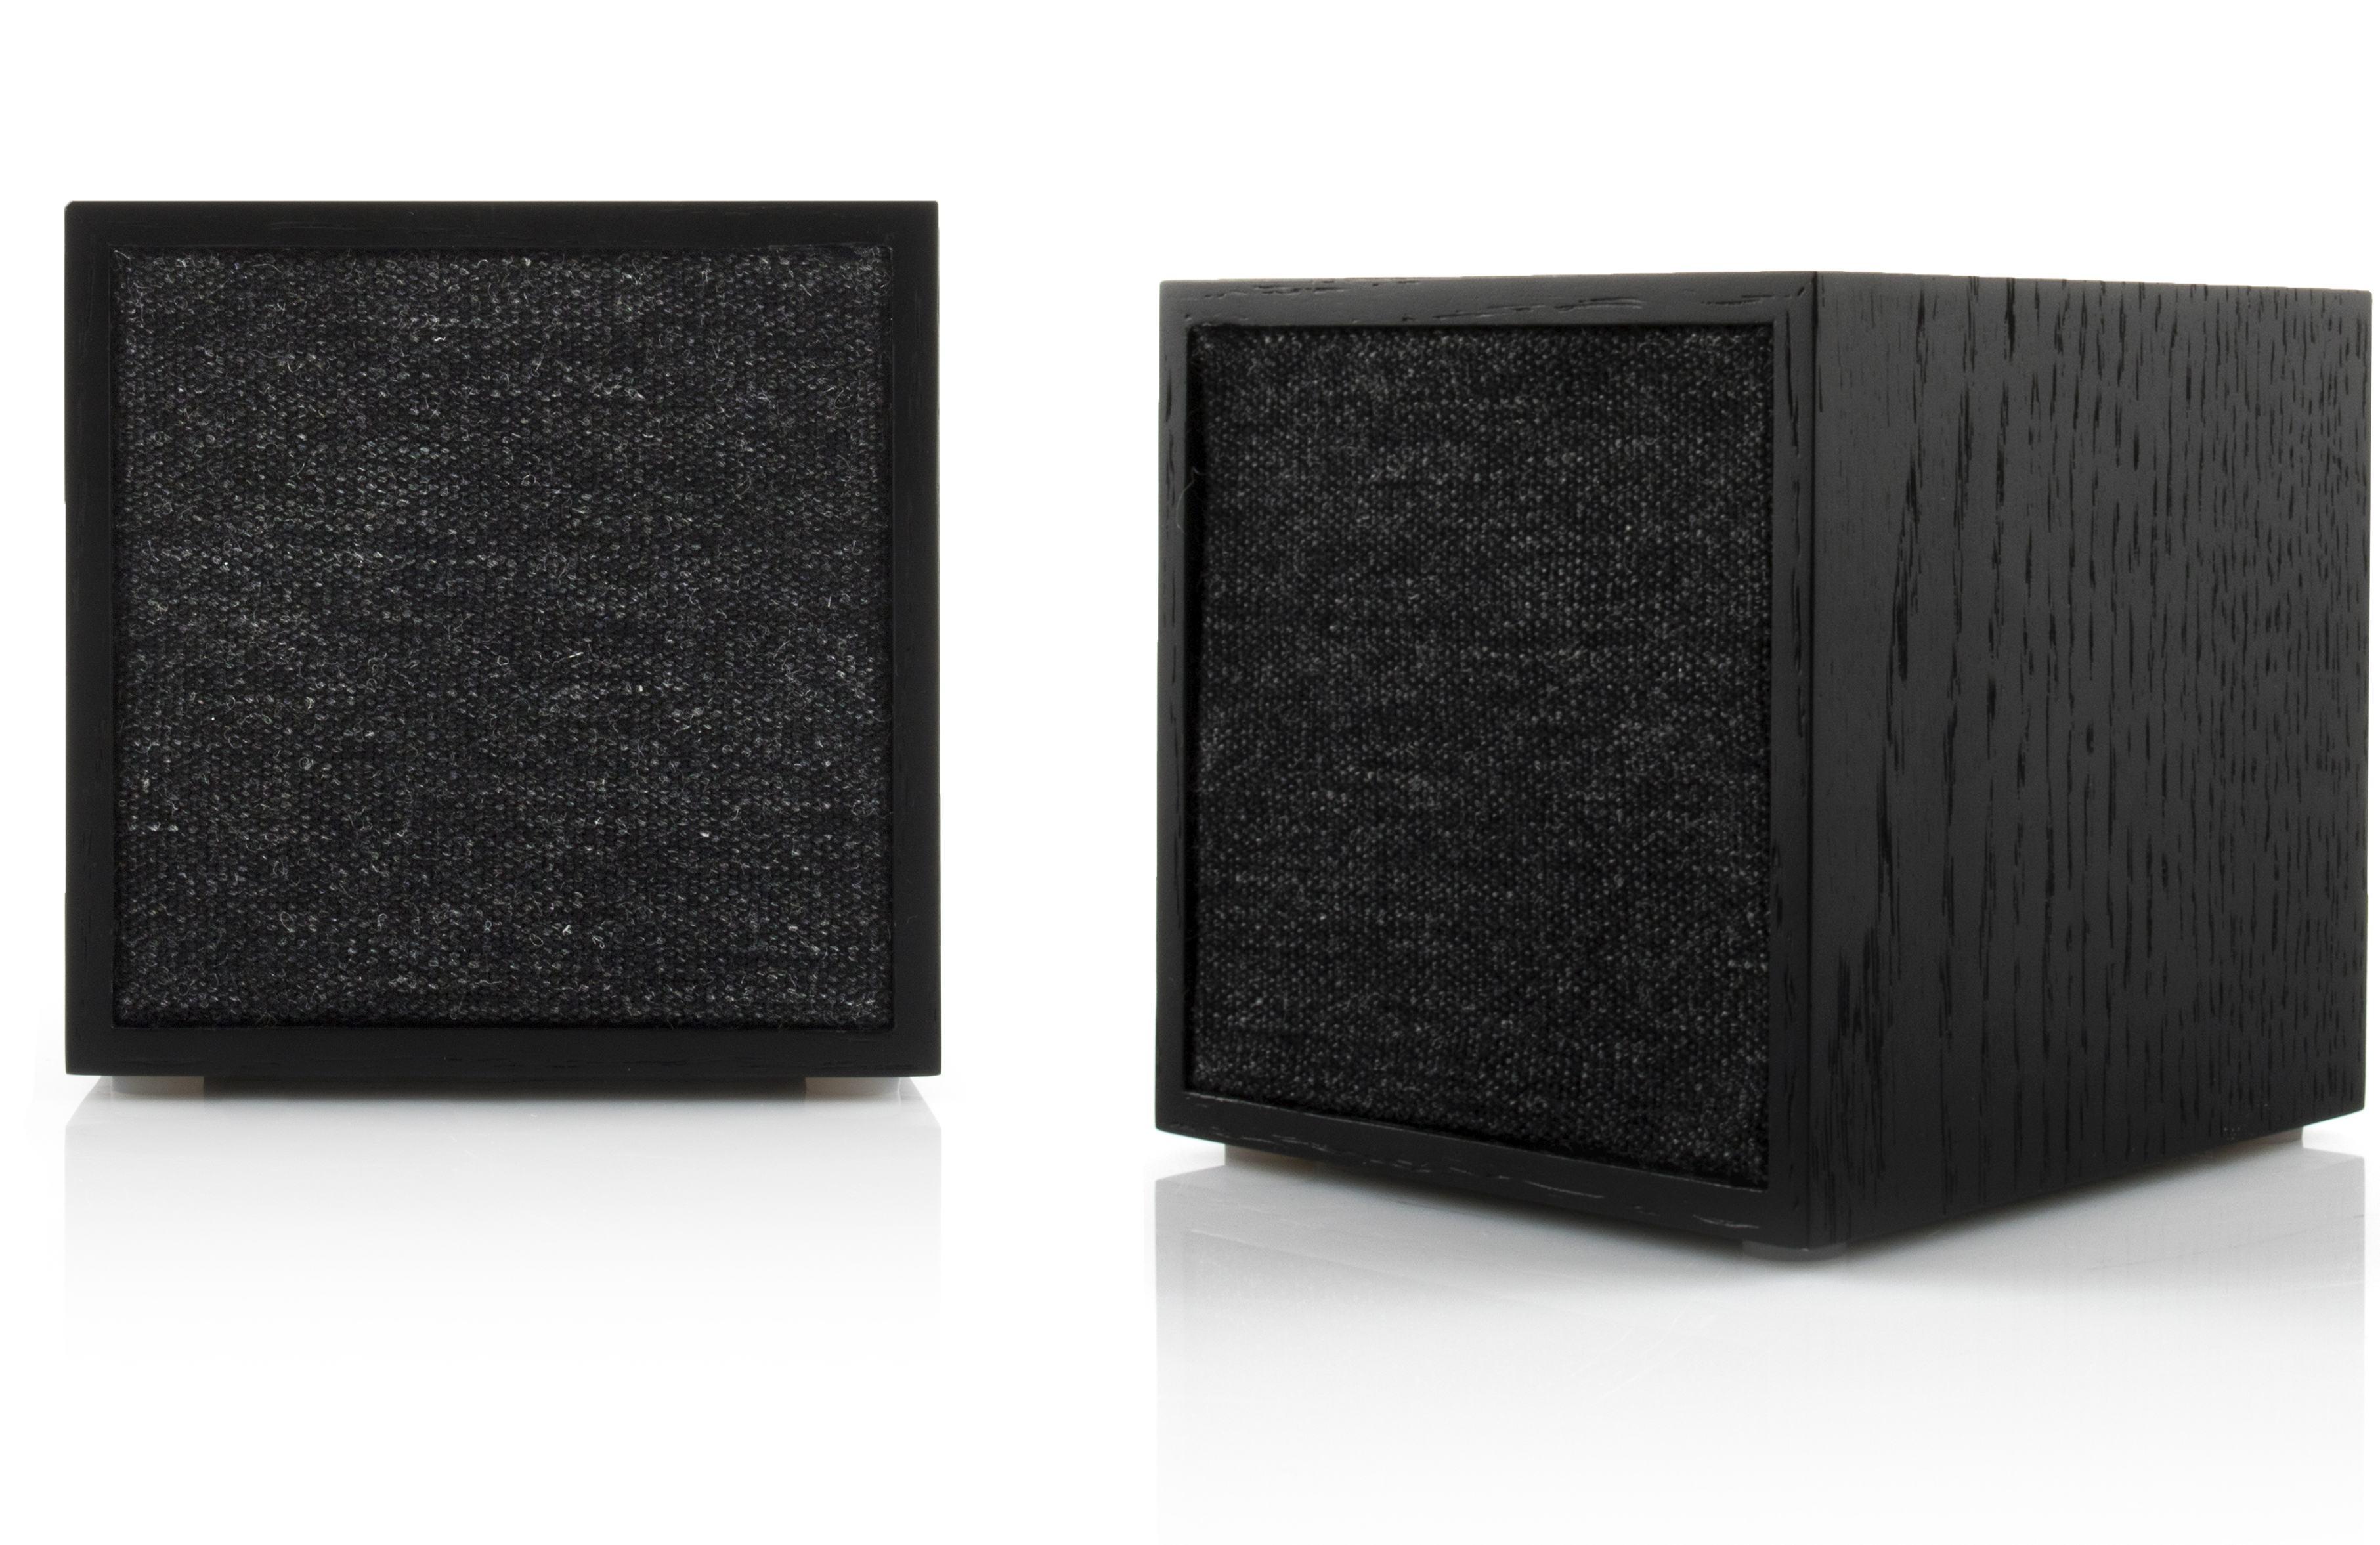 Tivoli WIRELESS STEREO COMBO wifi speaker